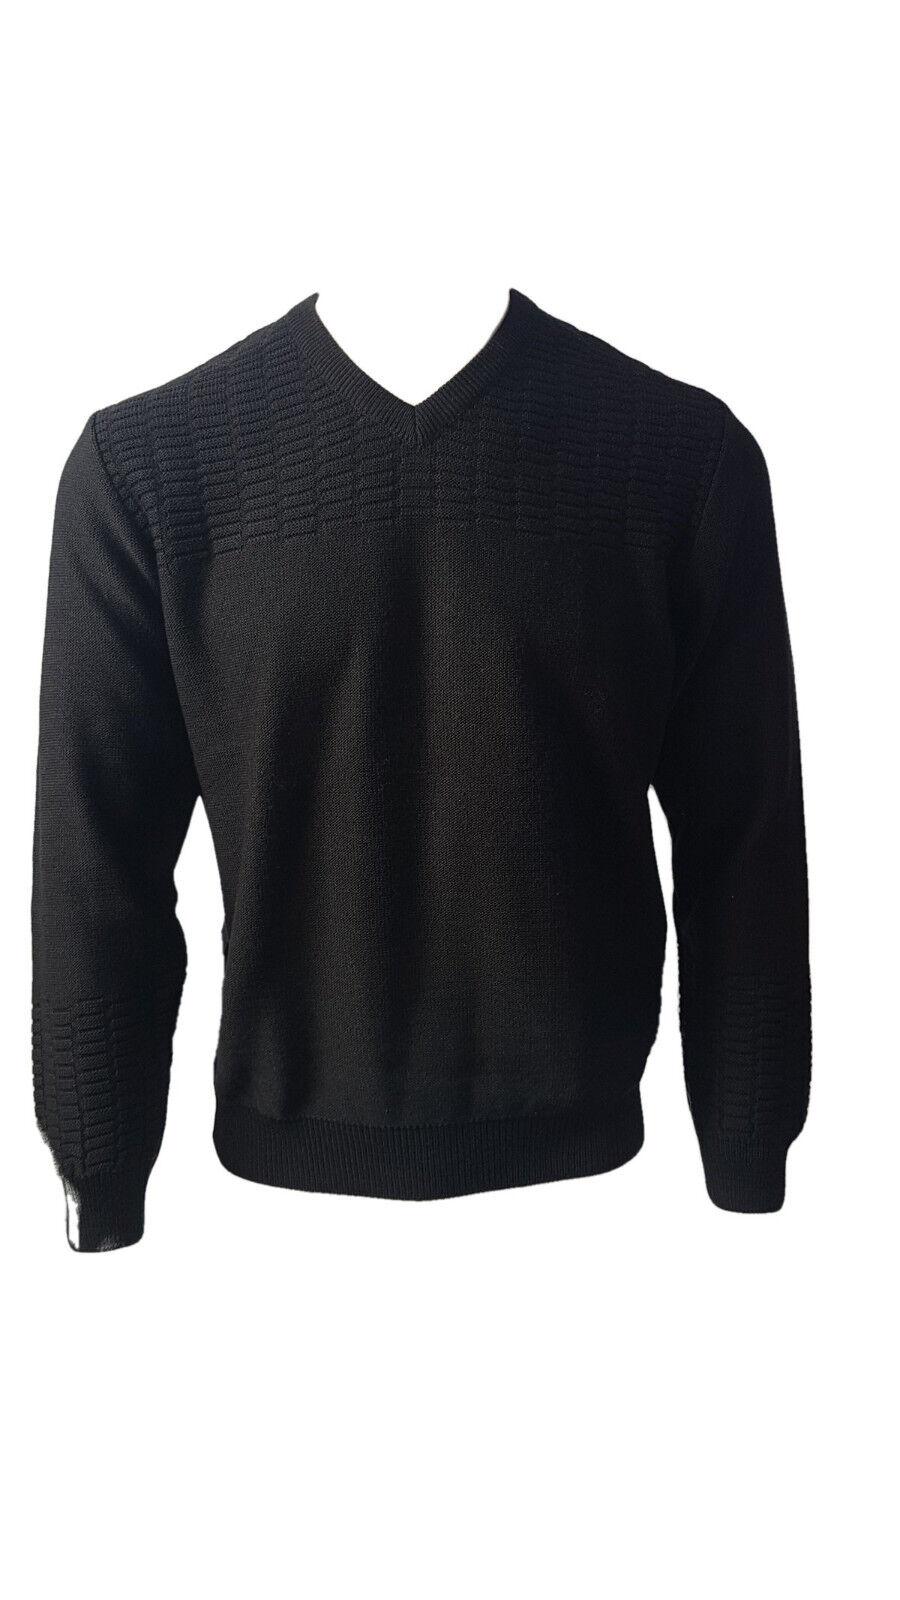 Pull BERAC col en V maille jersey 3165 noir T. 7 (XXXL) Prix. Maga.